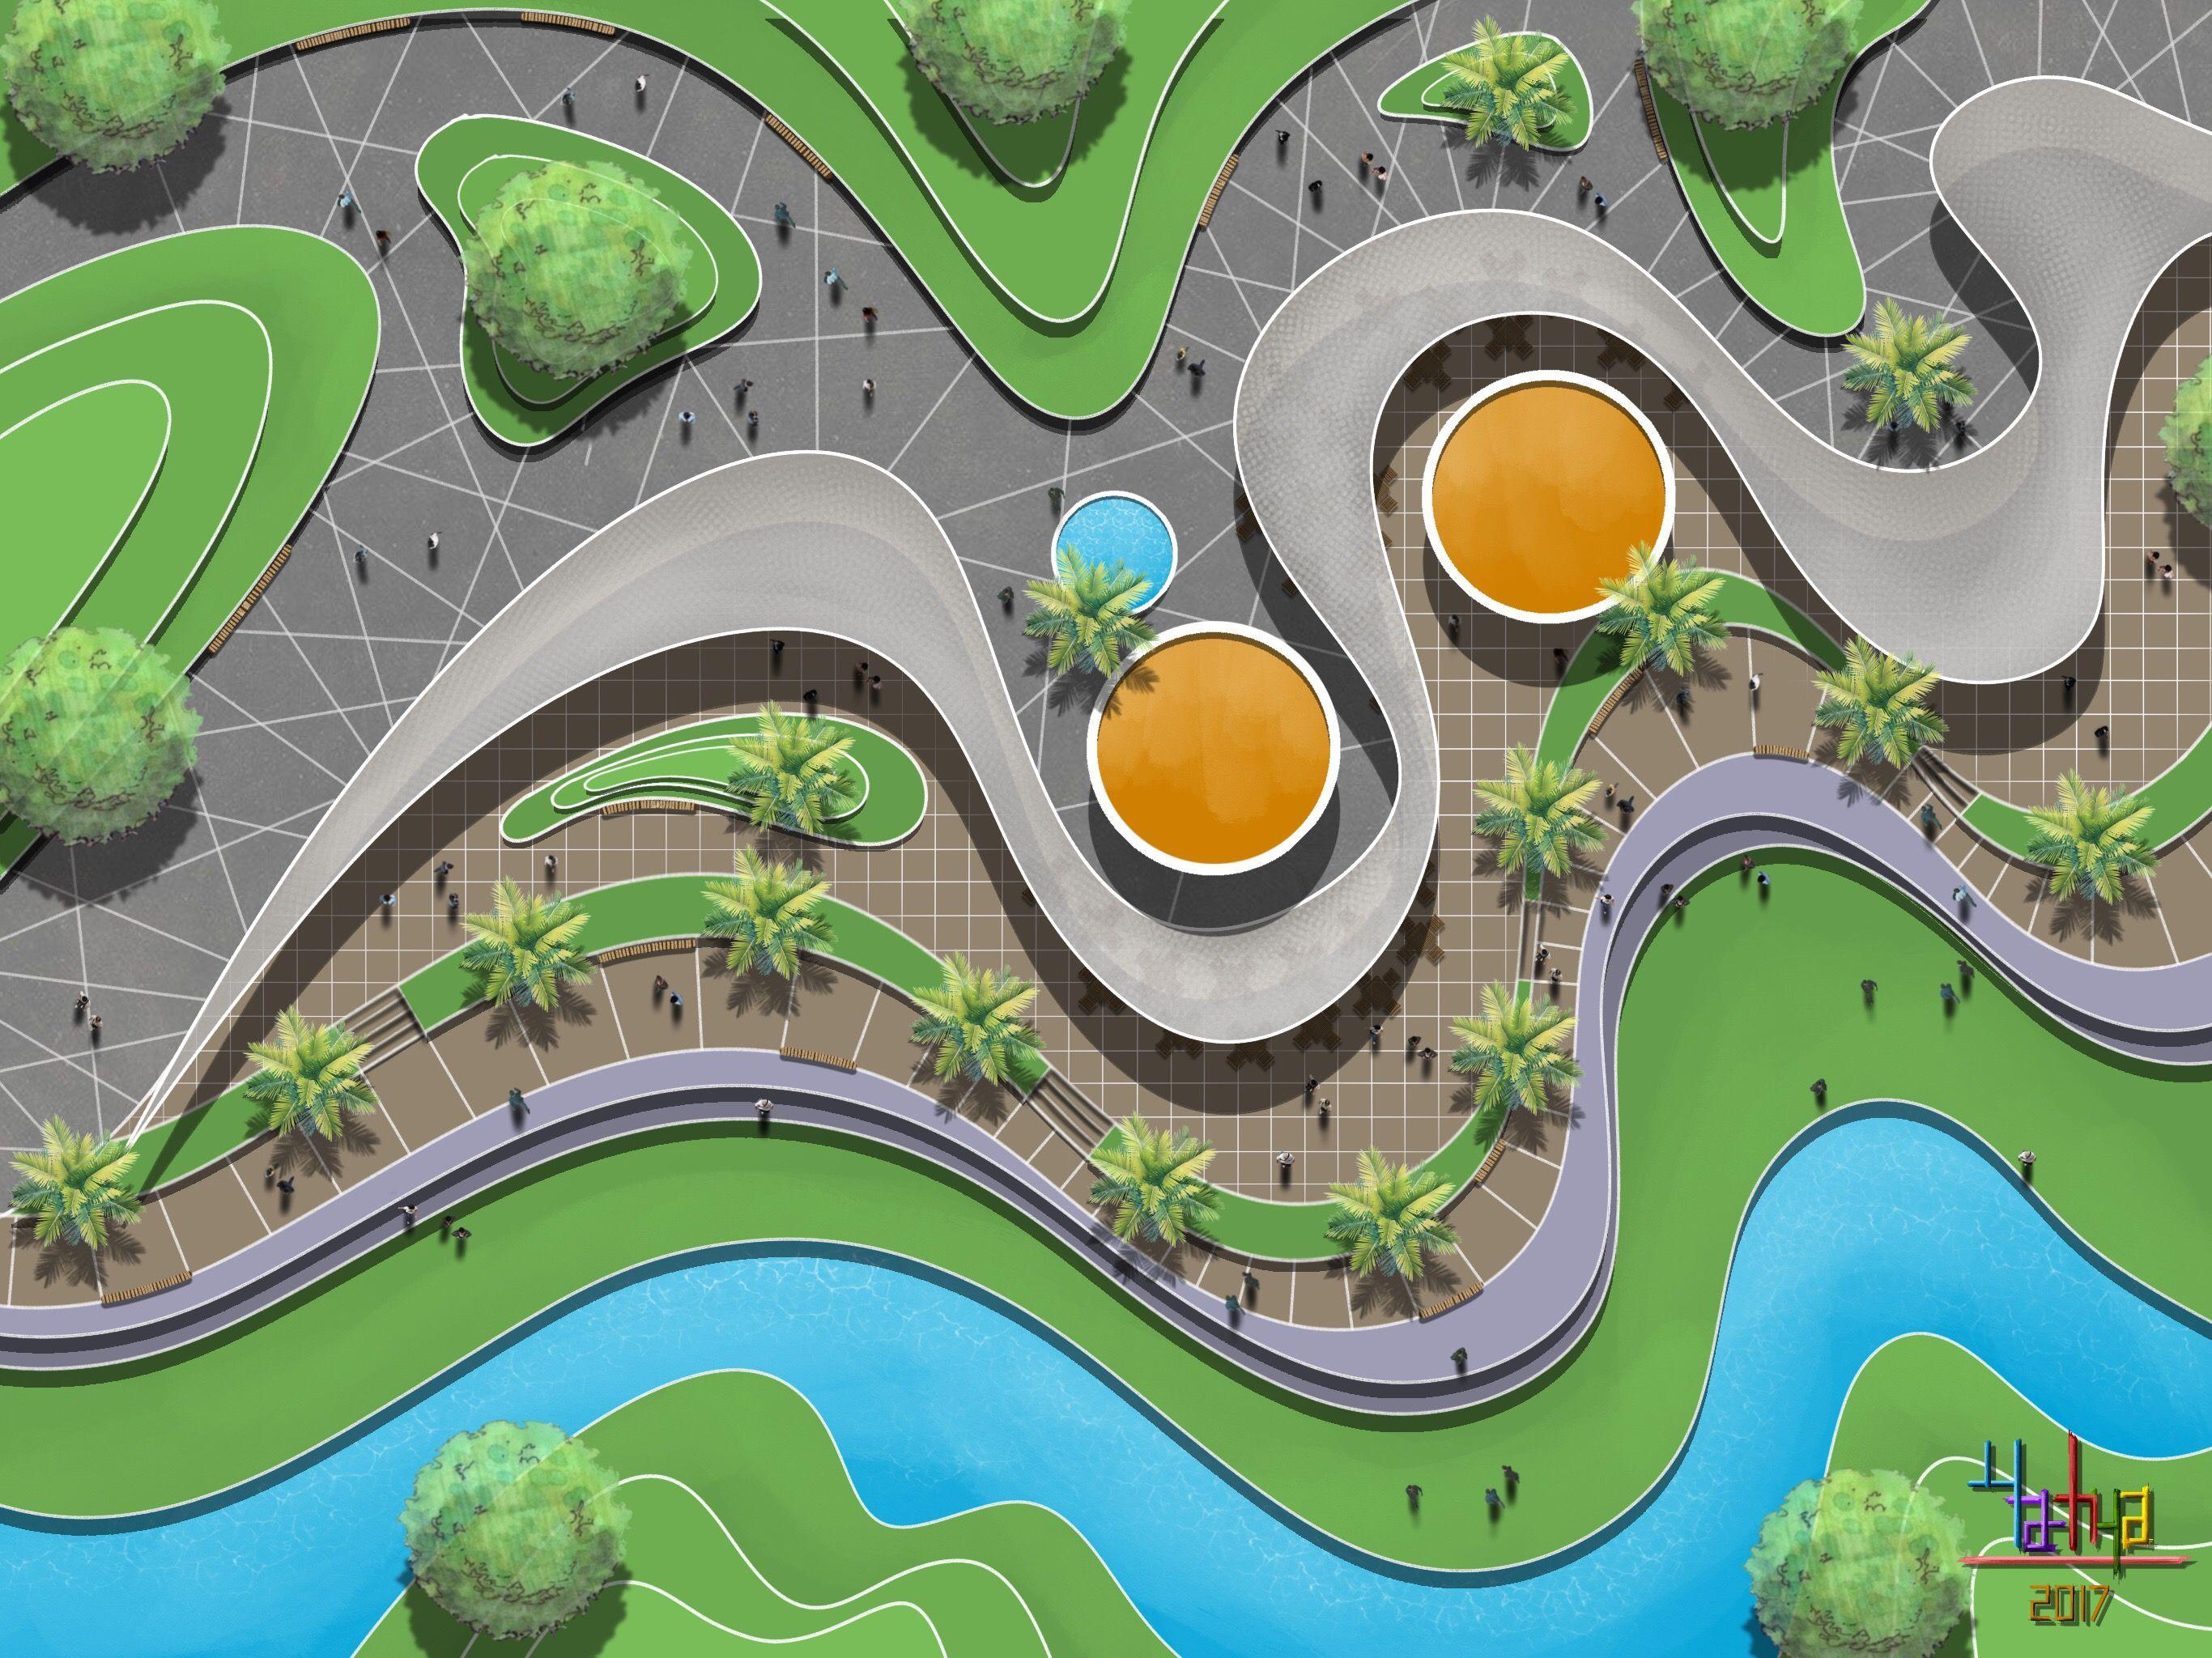 Pin By Sufi On Peyzaj Projeleri Landscape Design Drawings Urban Landscape Design Landscape Architecture Design